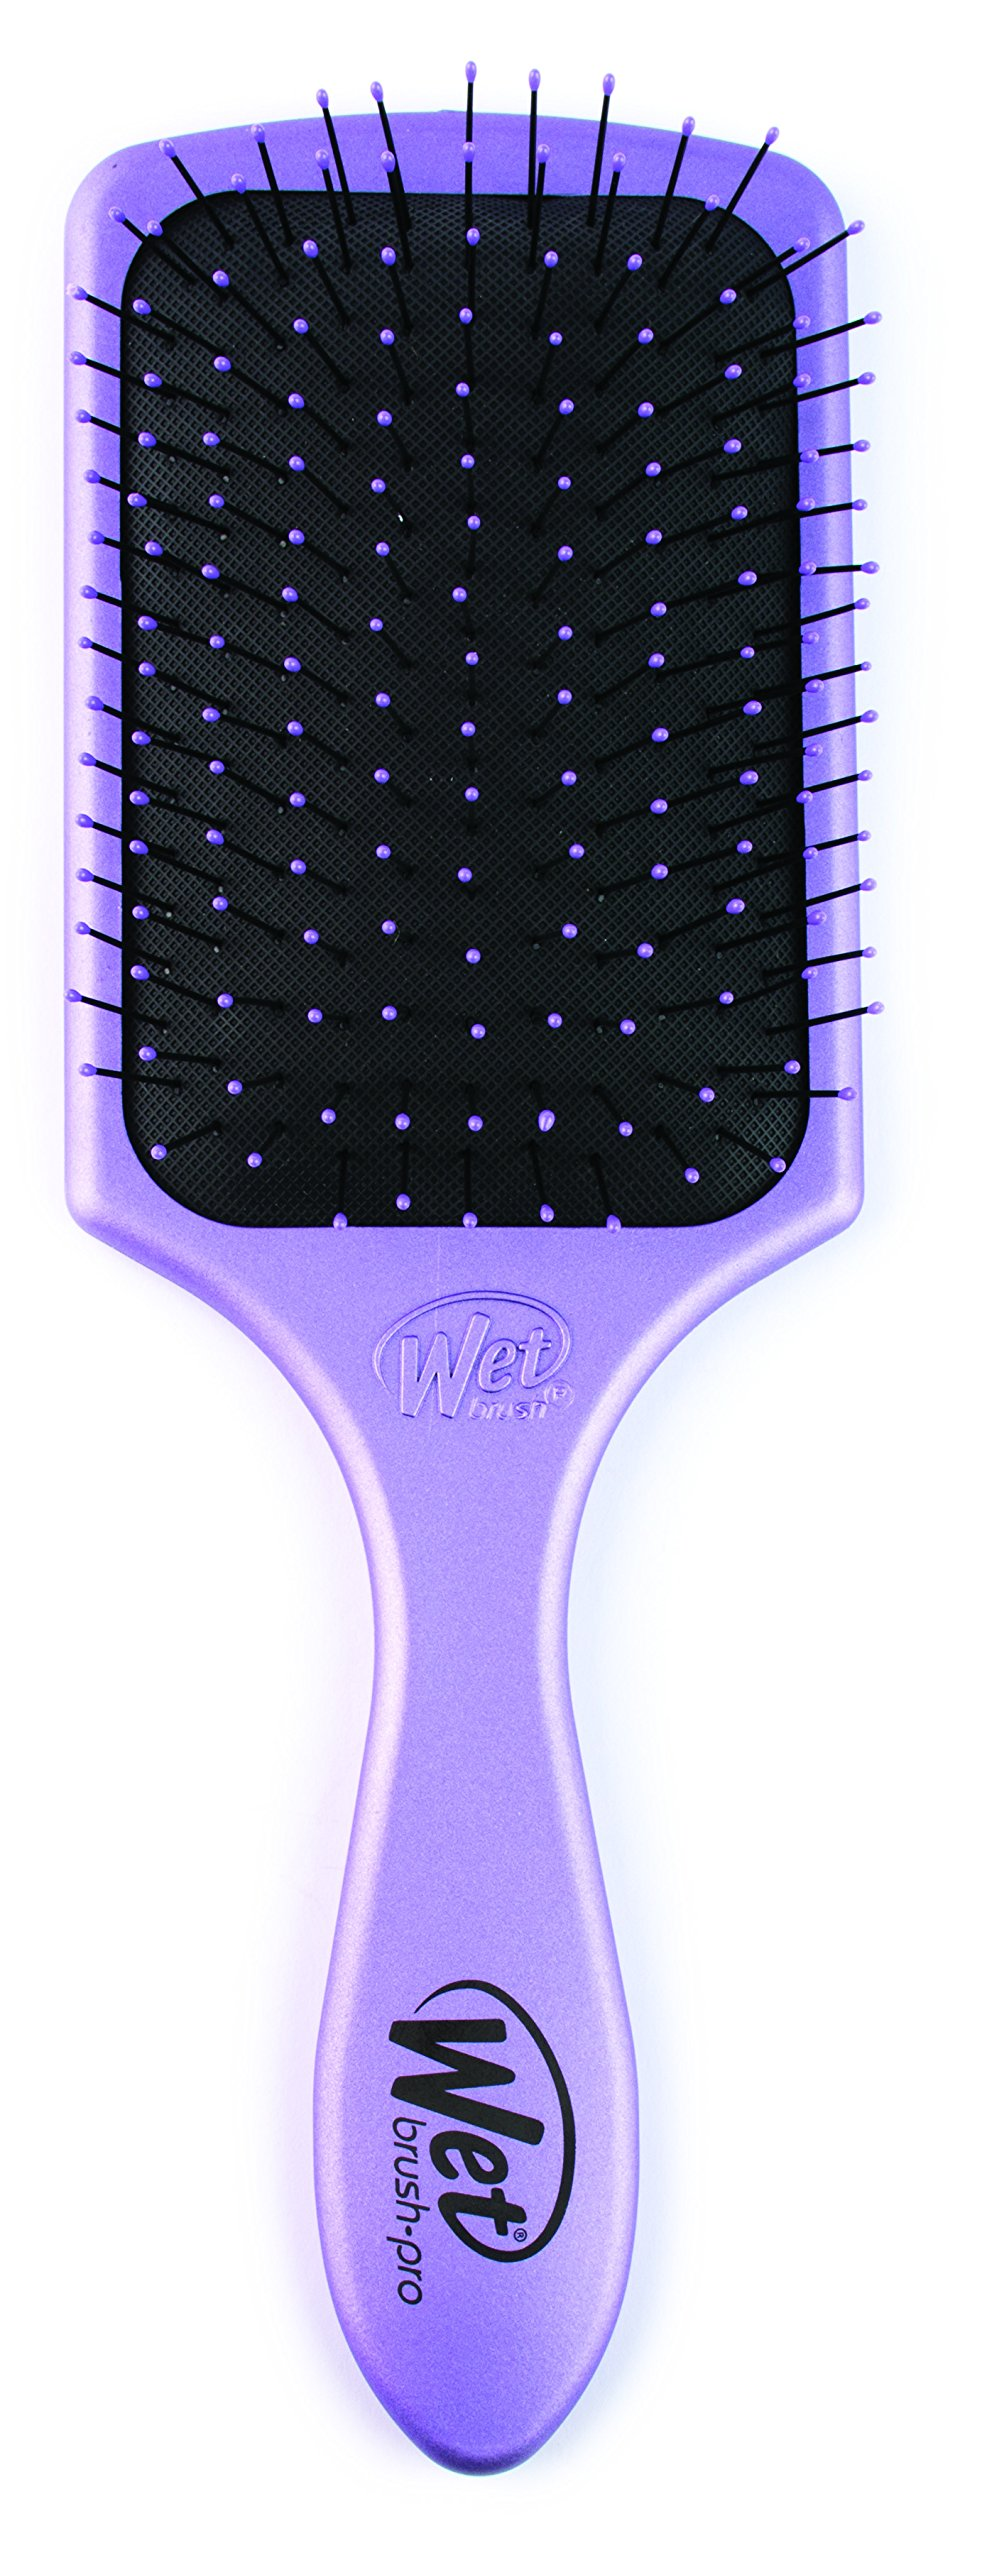 The Wet Brush Pro Select Paddle - Metallic Purple